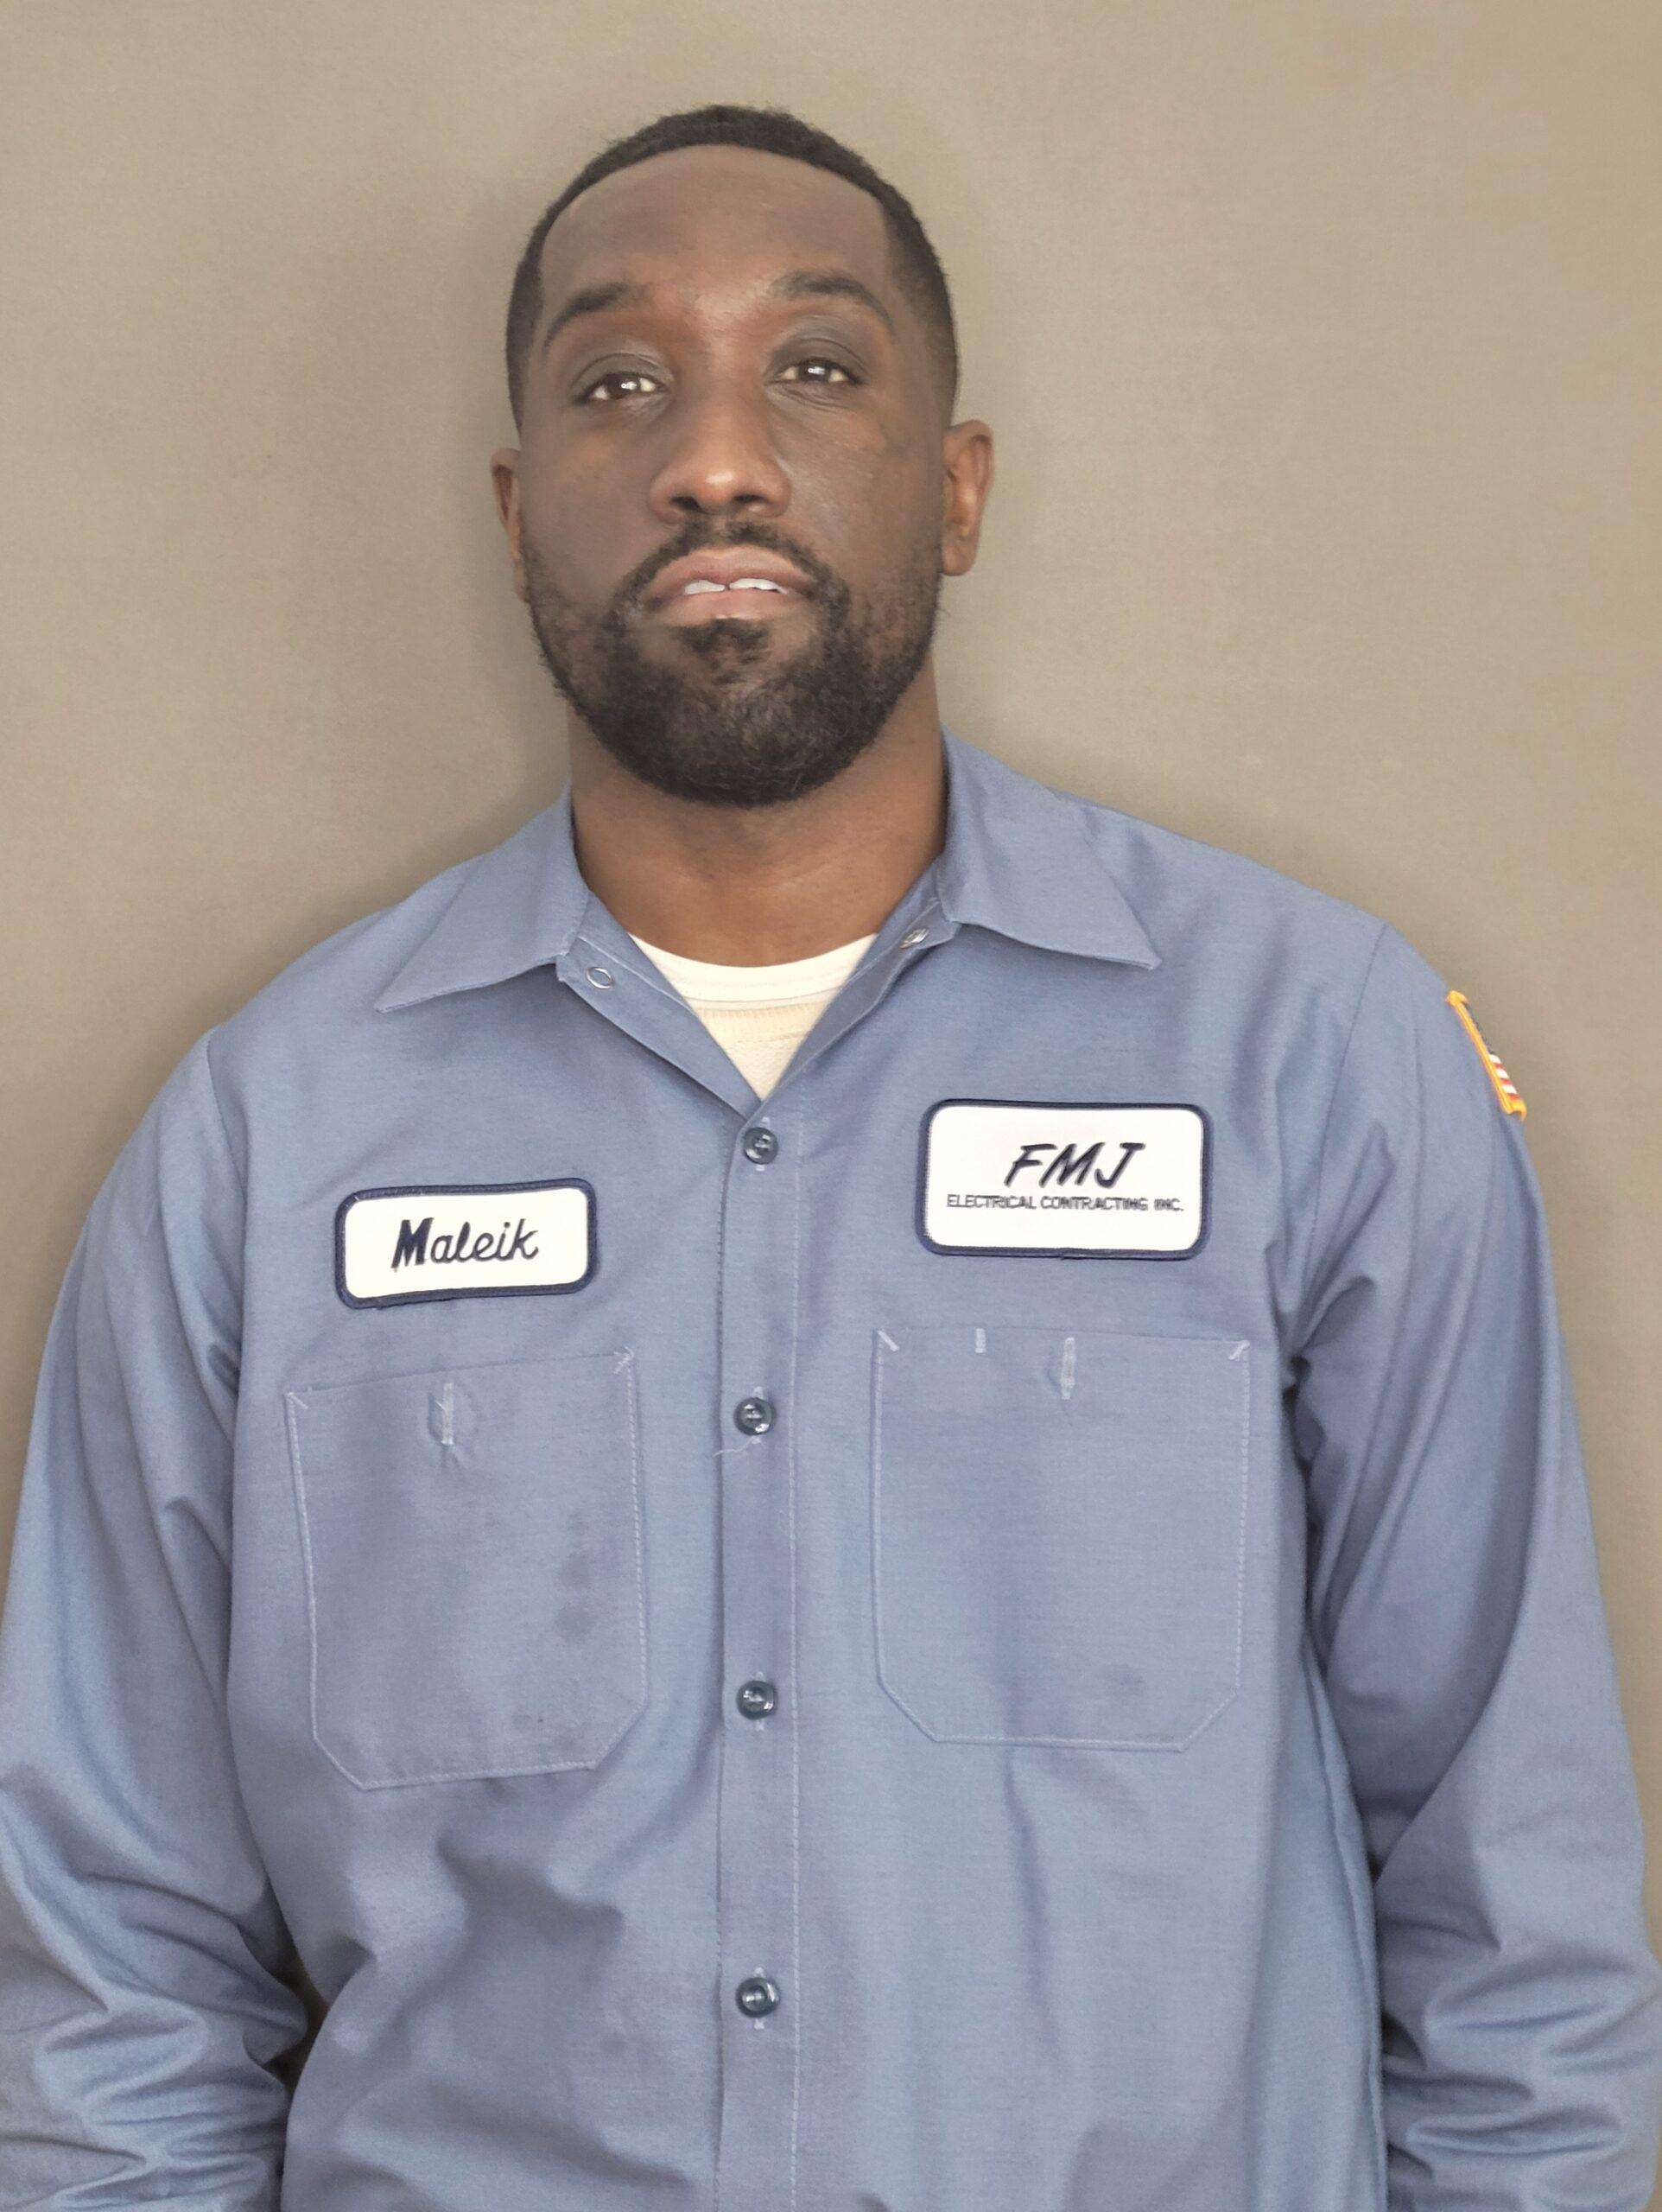 FMJ Electrical Technician